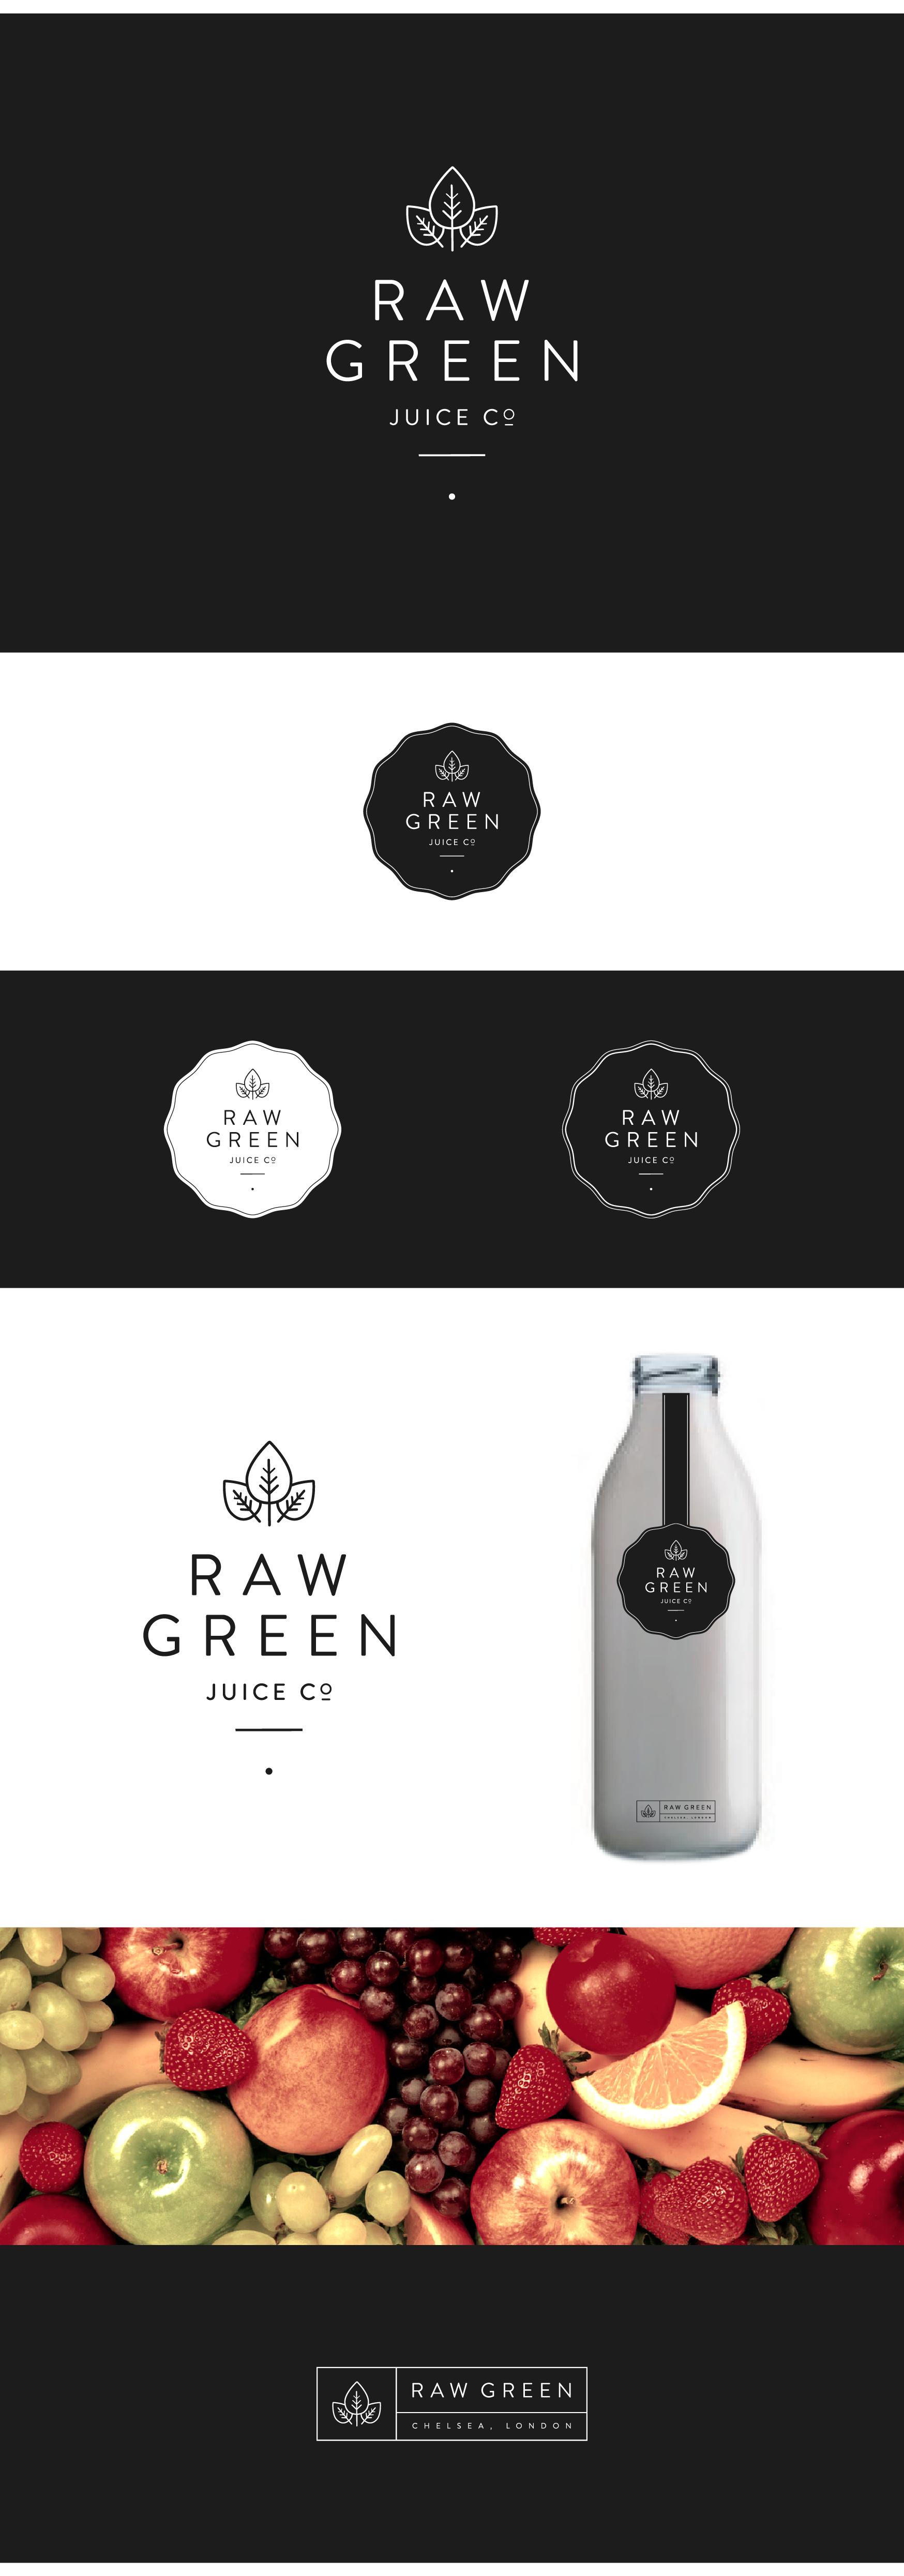 Brand for upmarket raw juice company